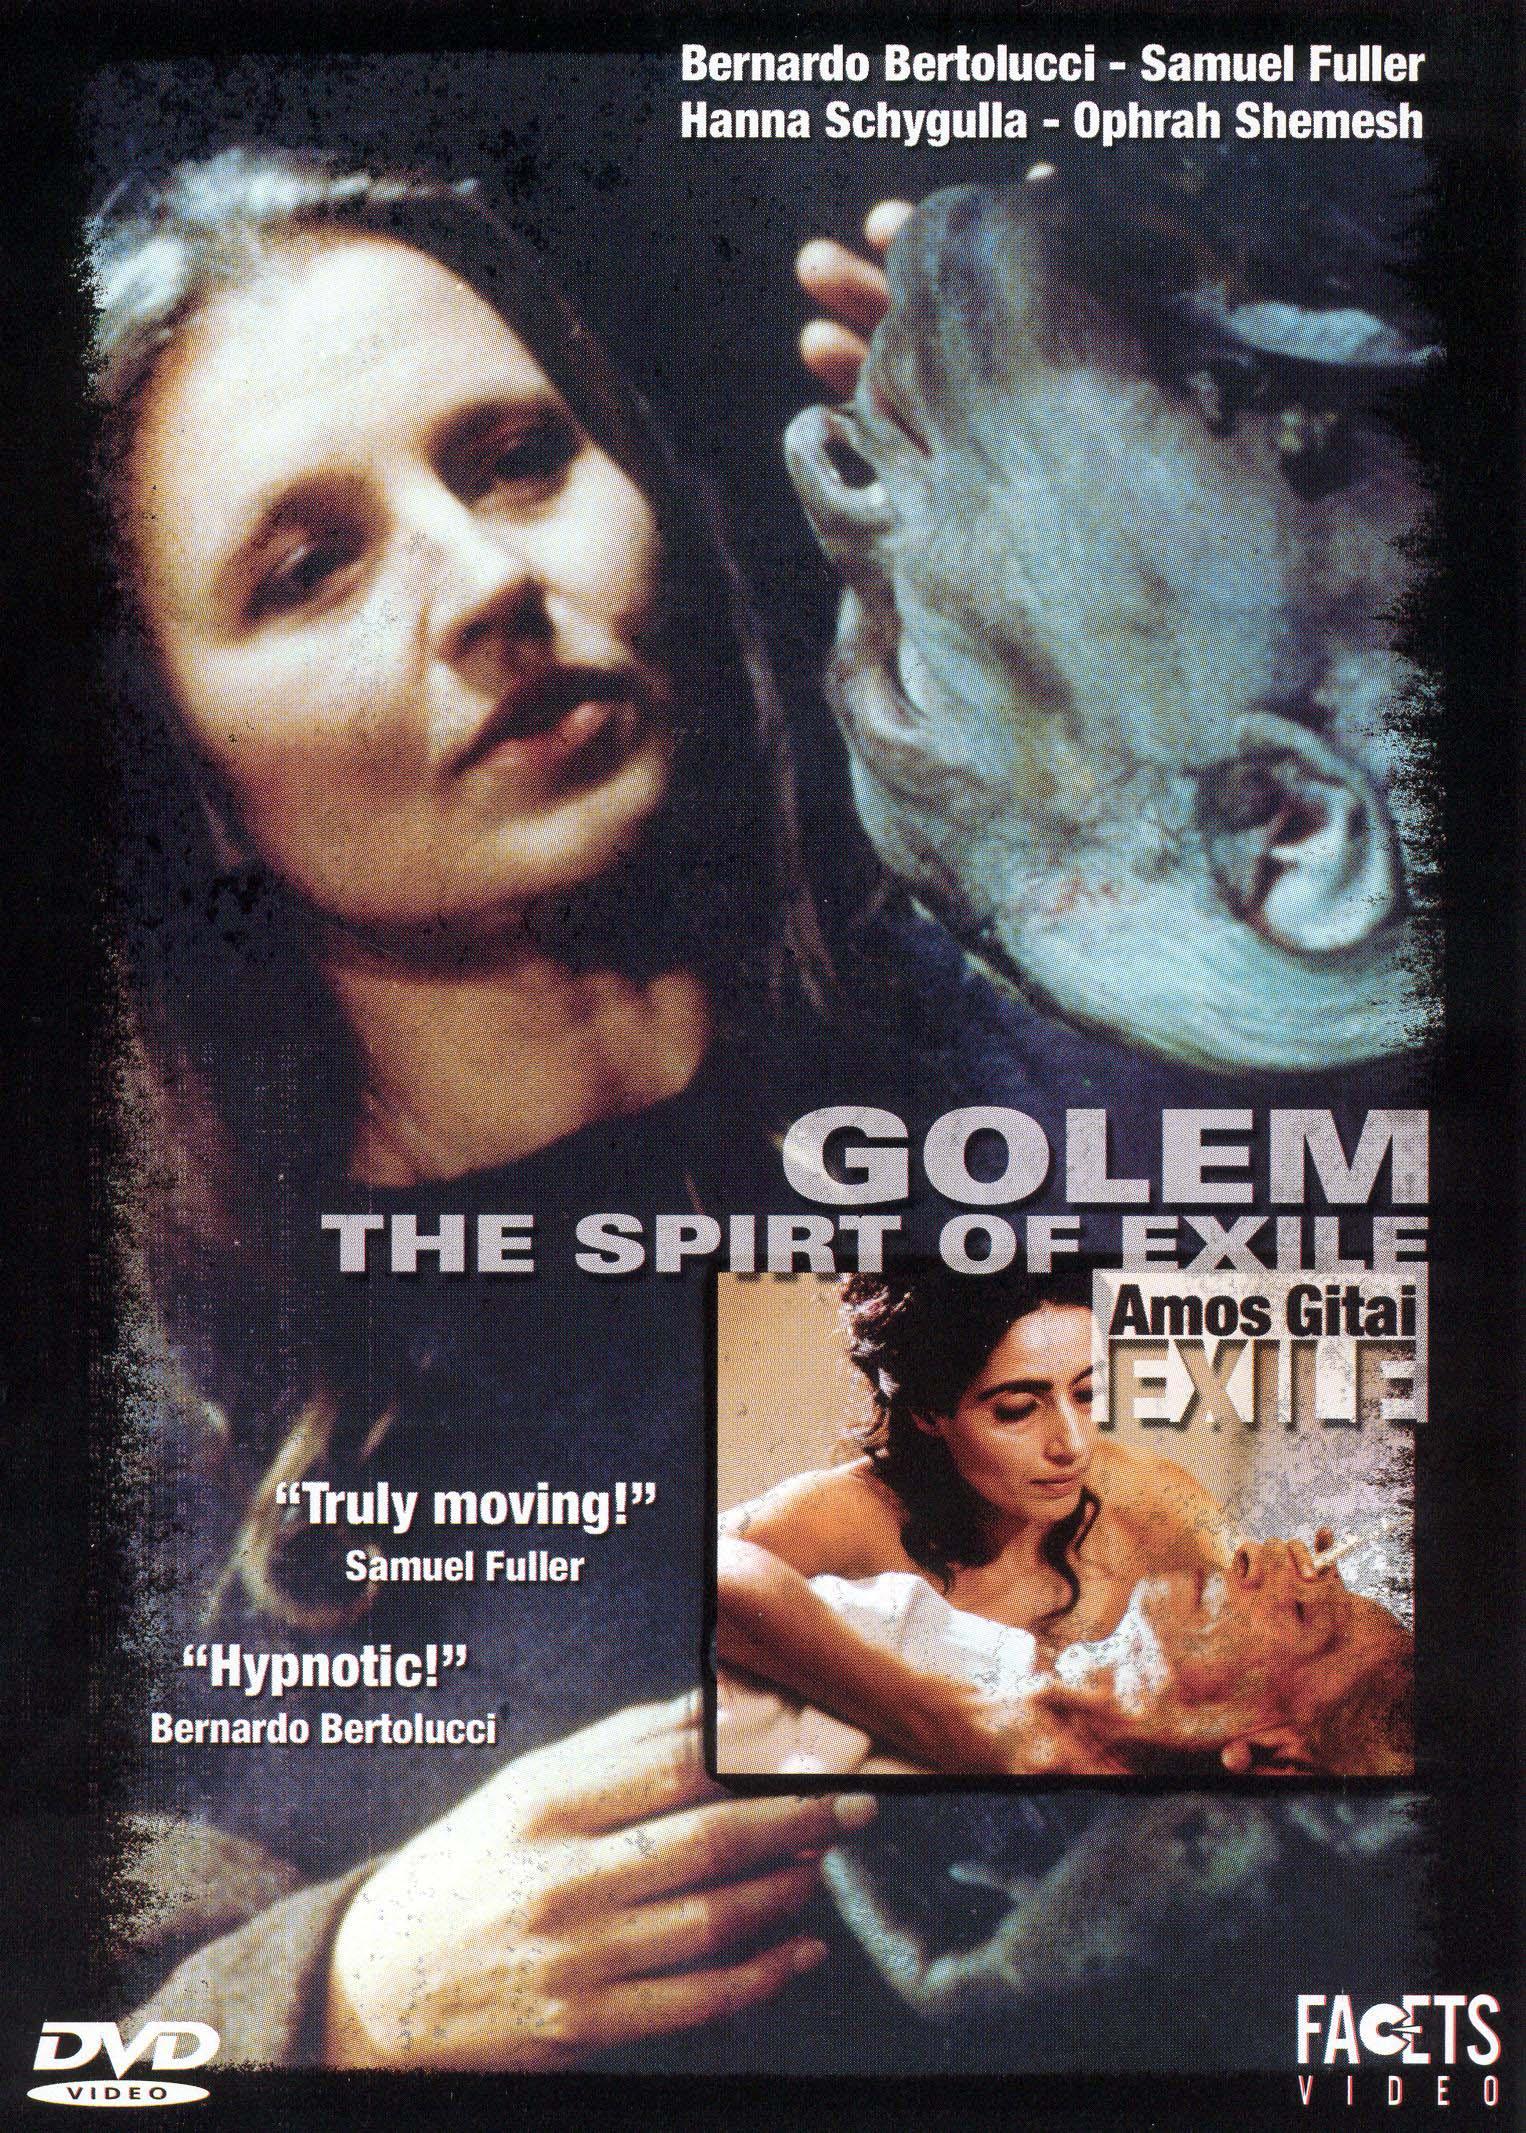 Golem, The Spirit of the Exile